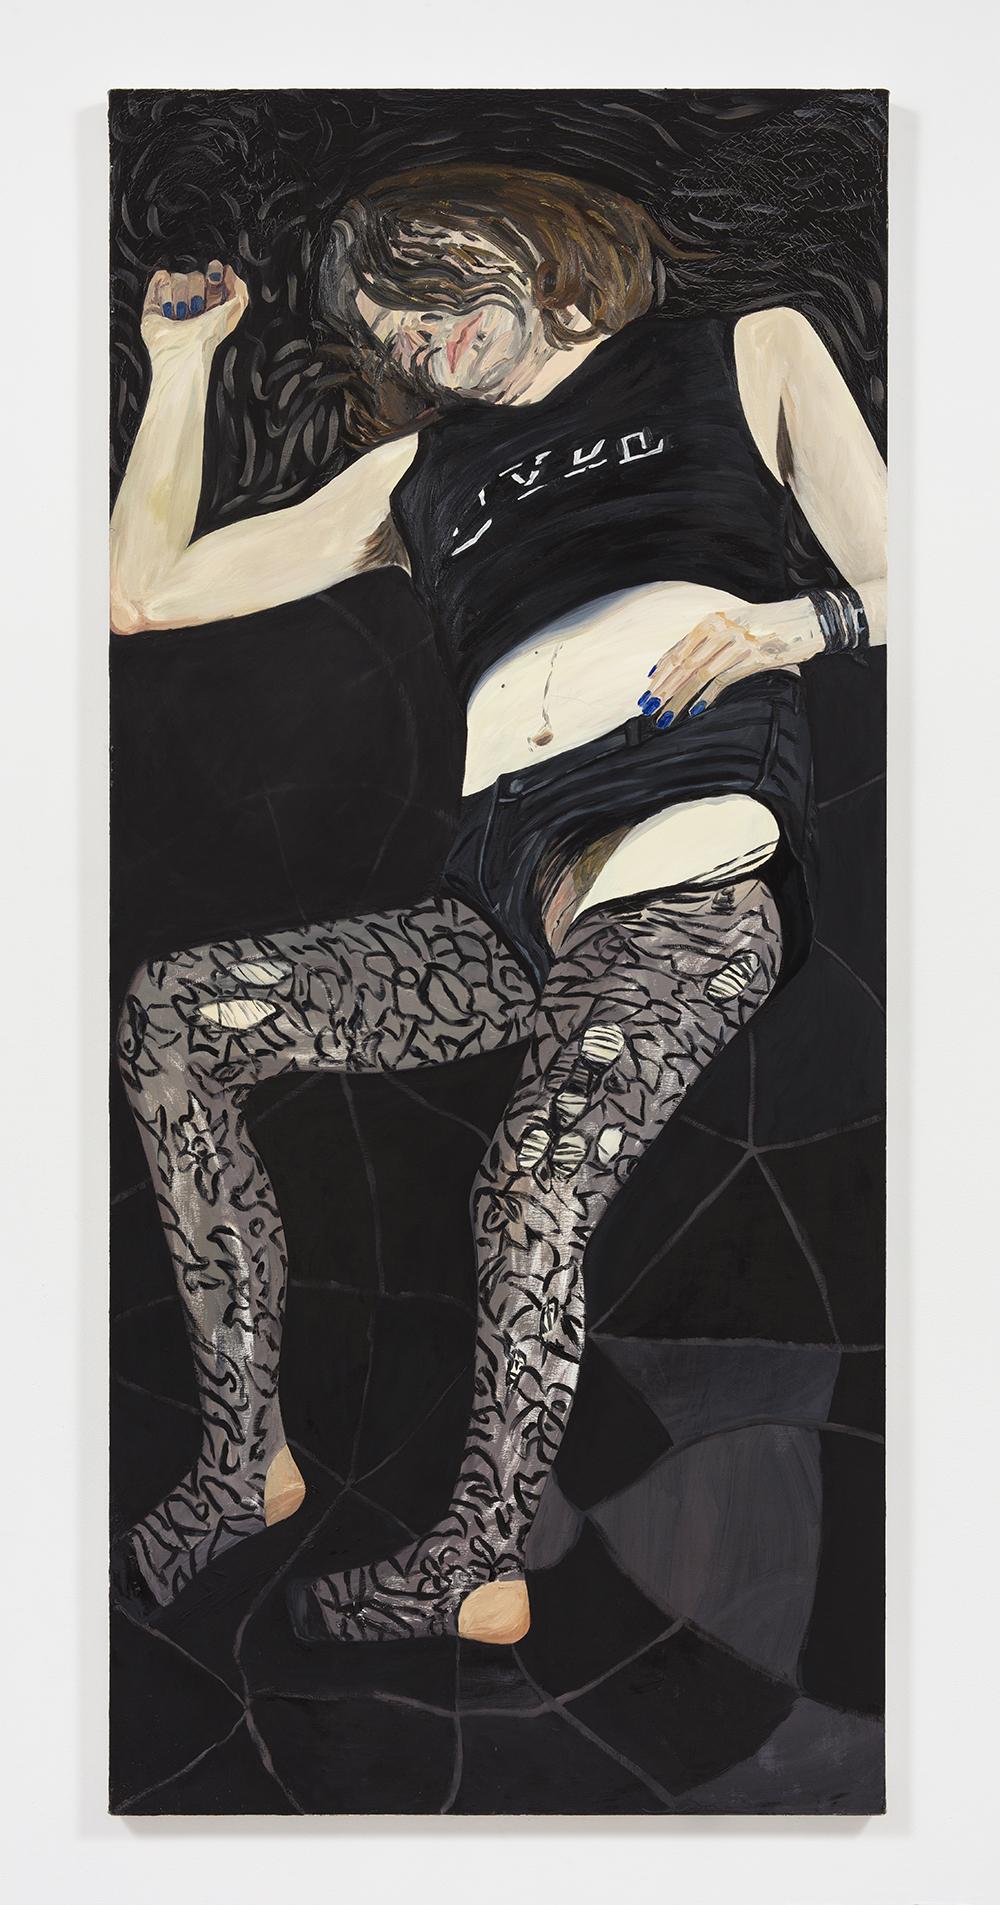 Rebecca Shippee. <em> Lucy(Dyke)</em>, 2019. Oil on canvas, 80 x 40 inches (203.2 x 101.6 cm)